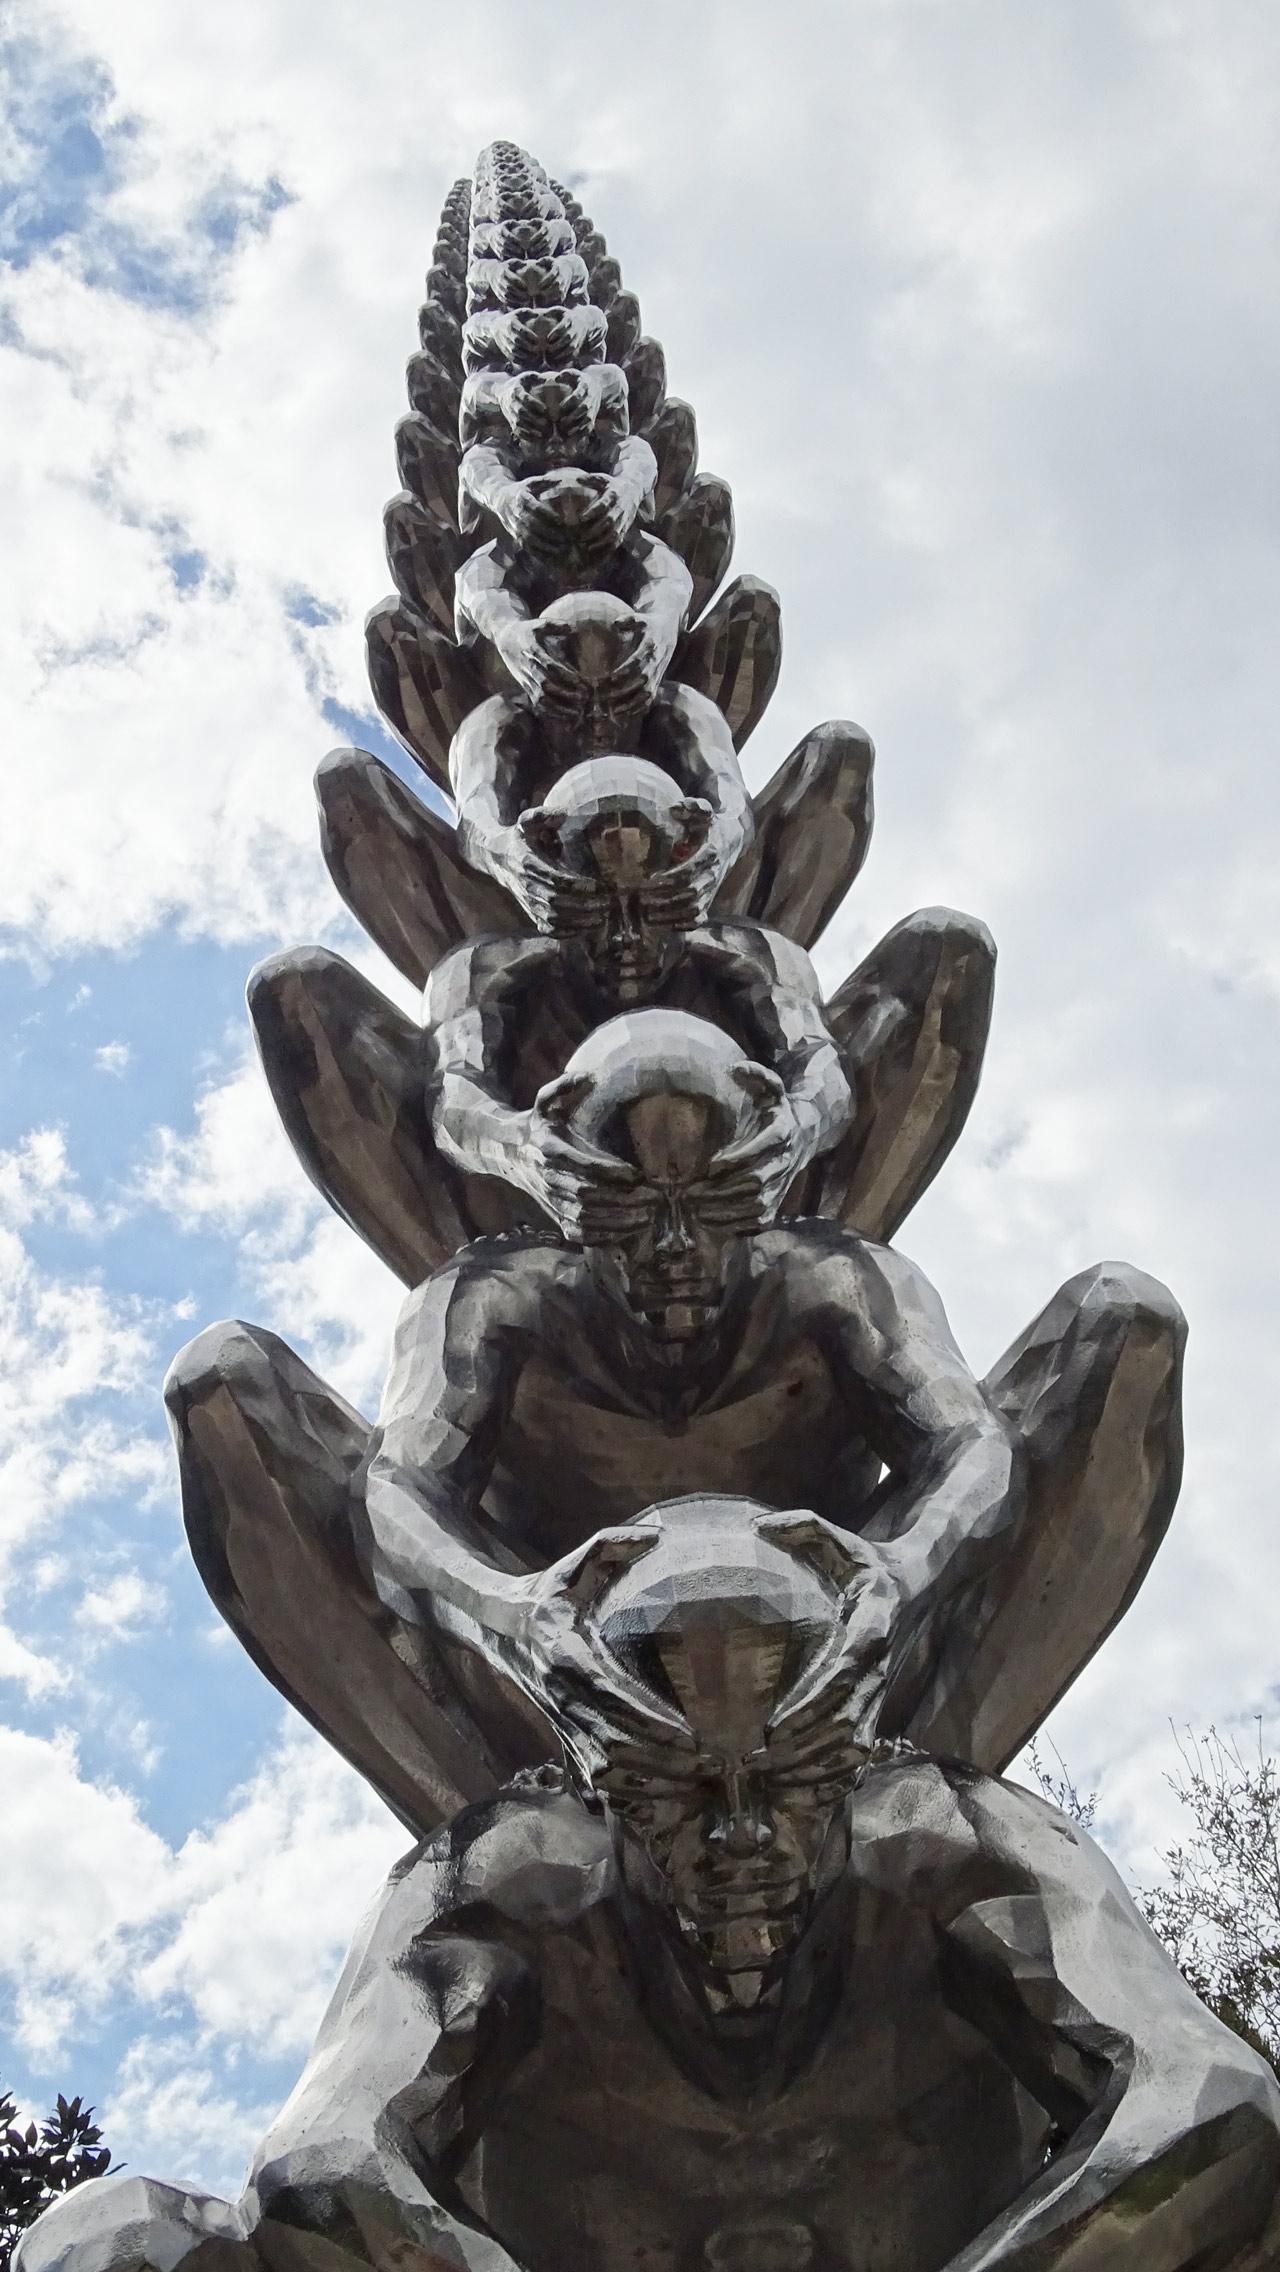 Karma by Do-Ho Suh (Korea) - Besthoff Sculpture Garden